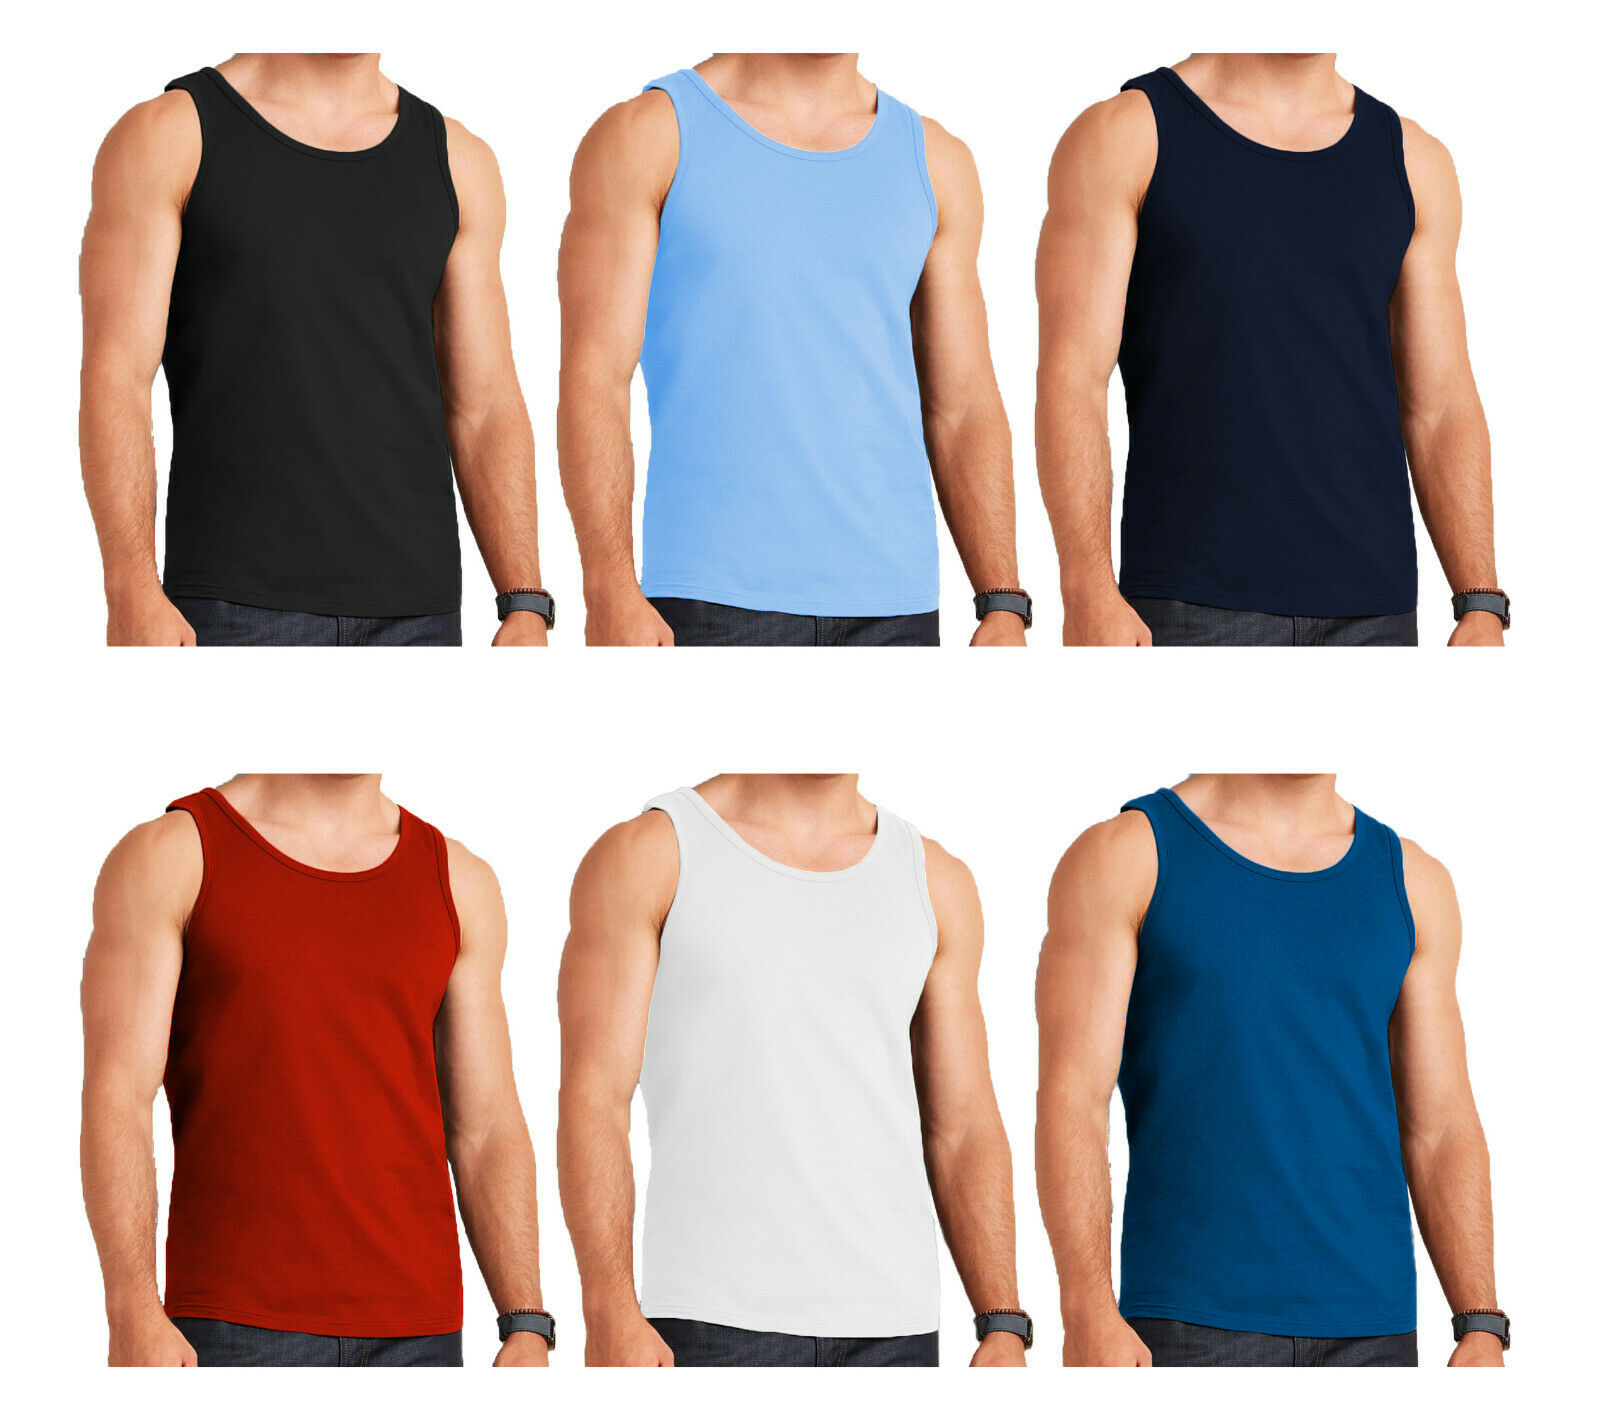 Brix Boys Undershirt Tank Top Tagless 100/% Cotton Super Soft 4 Pack Novelty.